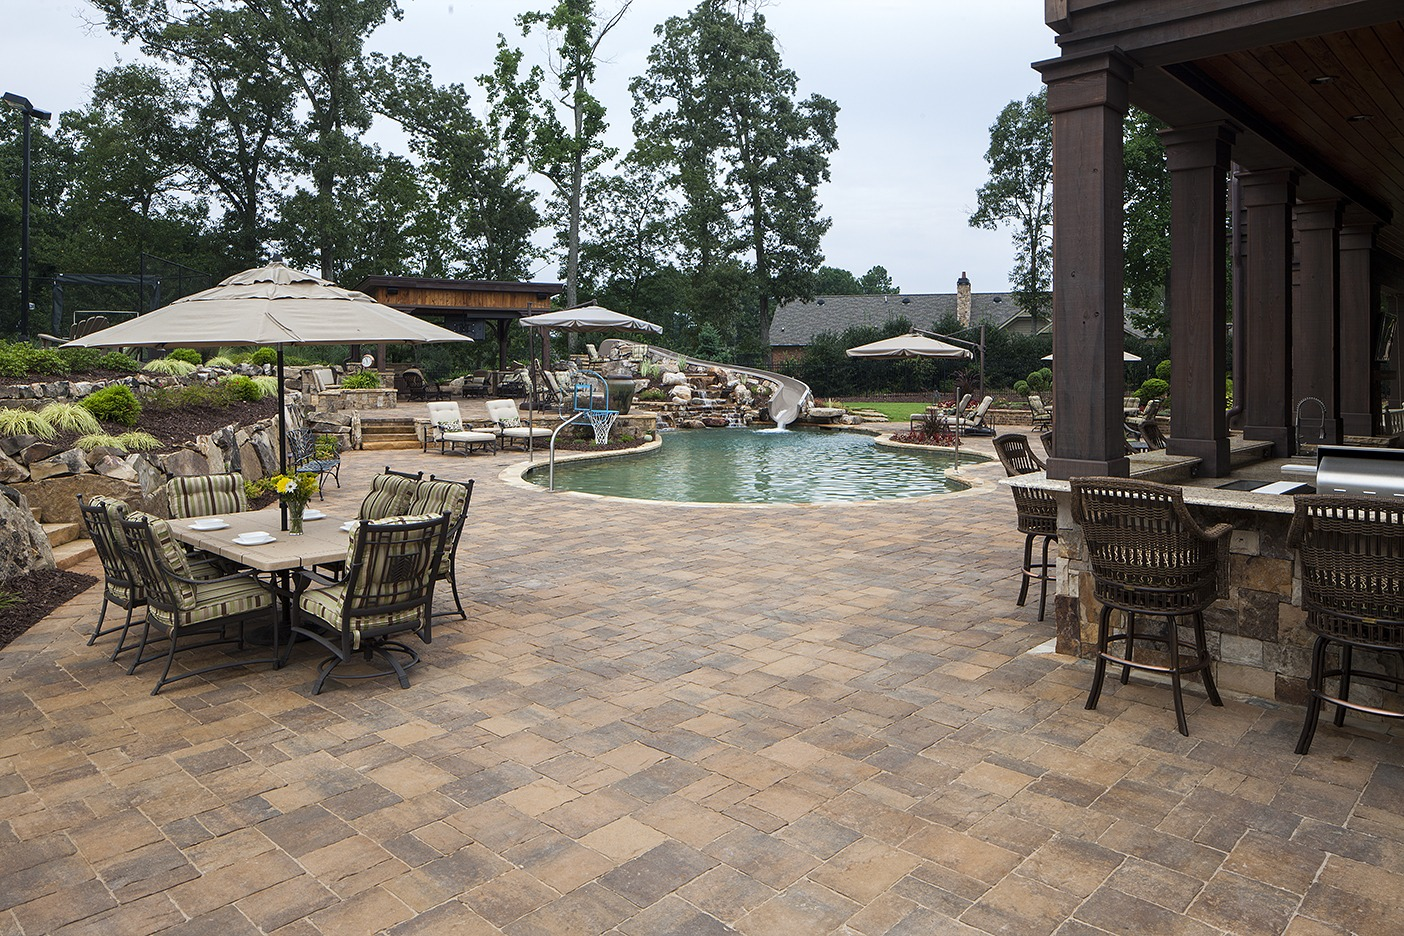 pool deck materials: pavers